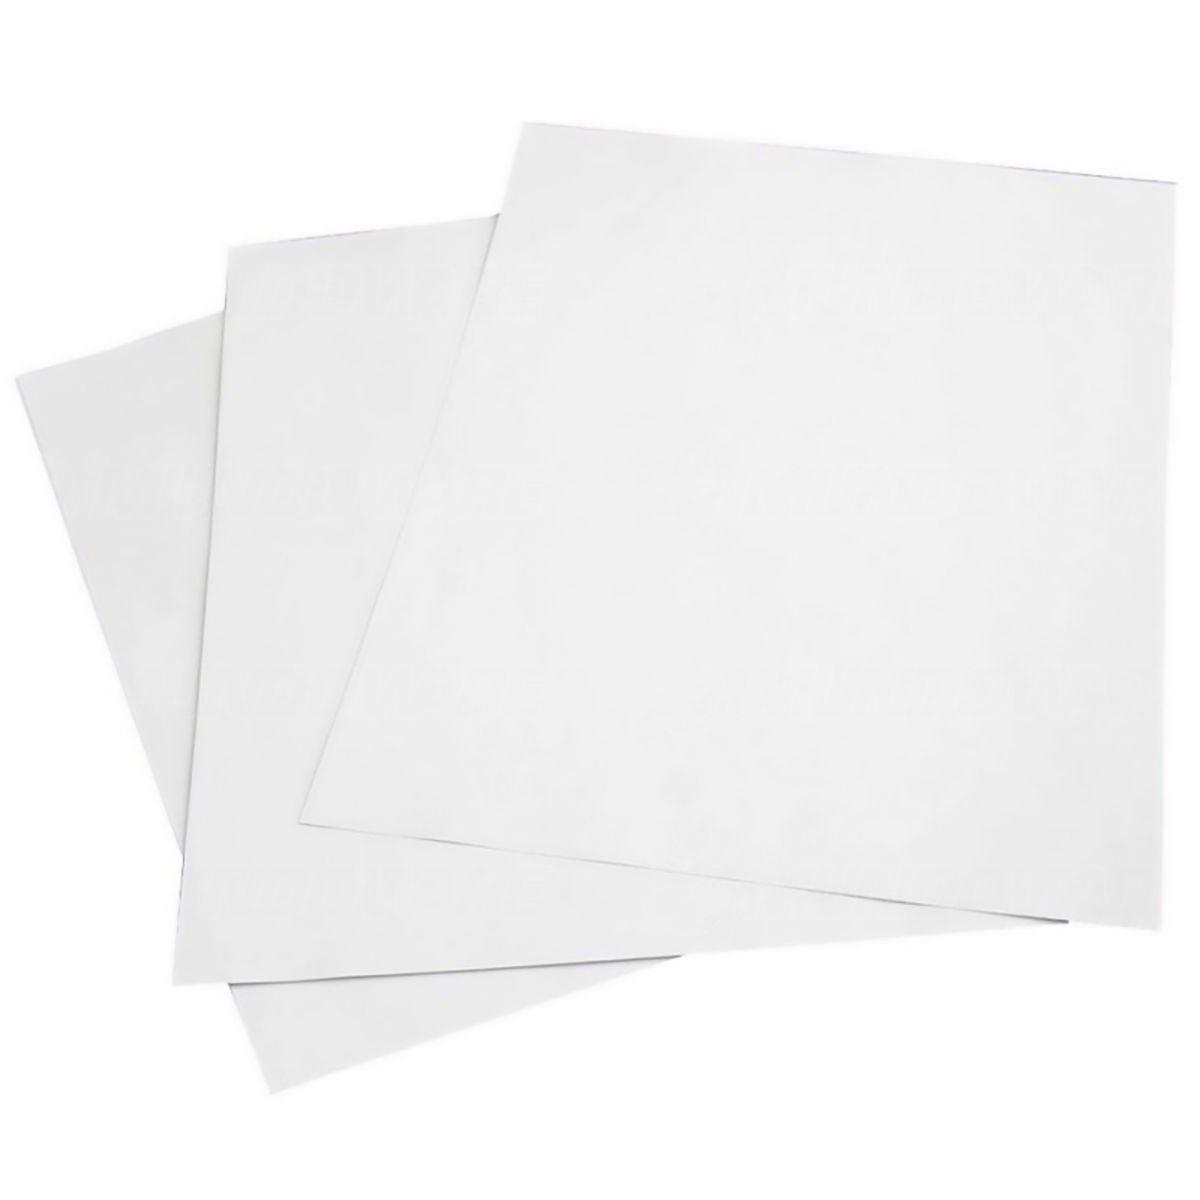 Papel Fotográfico Matte Fosco 108g A4 Branco Resistente à Água / 200 folhas